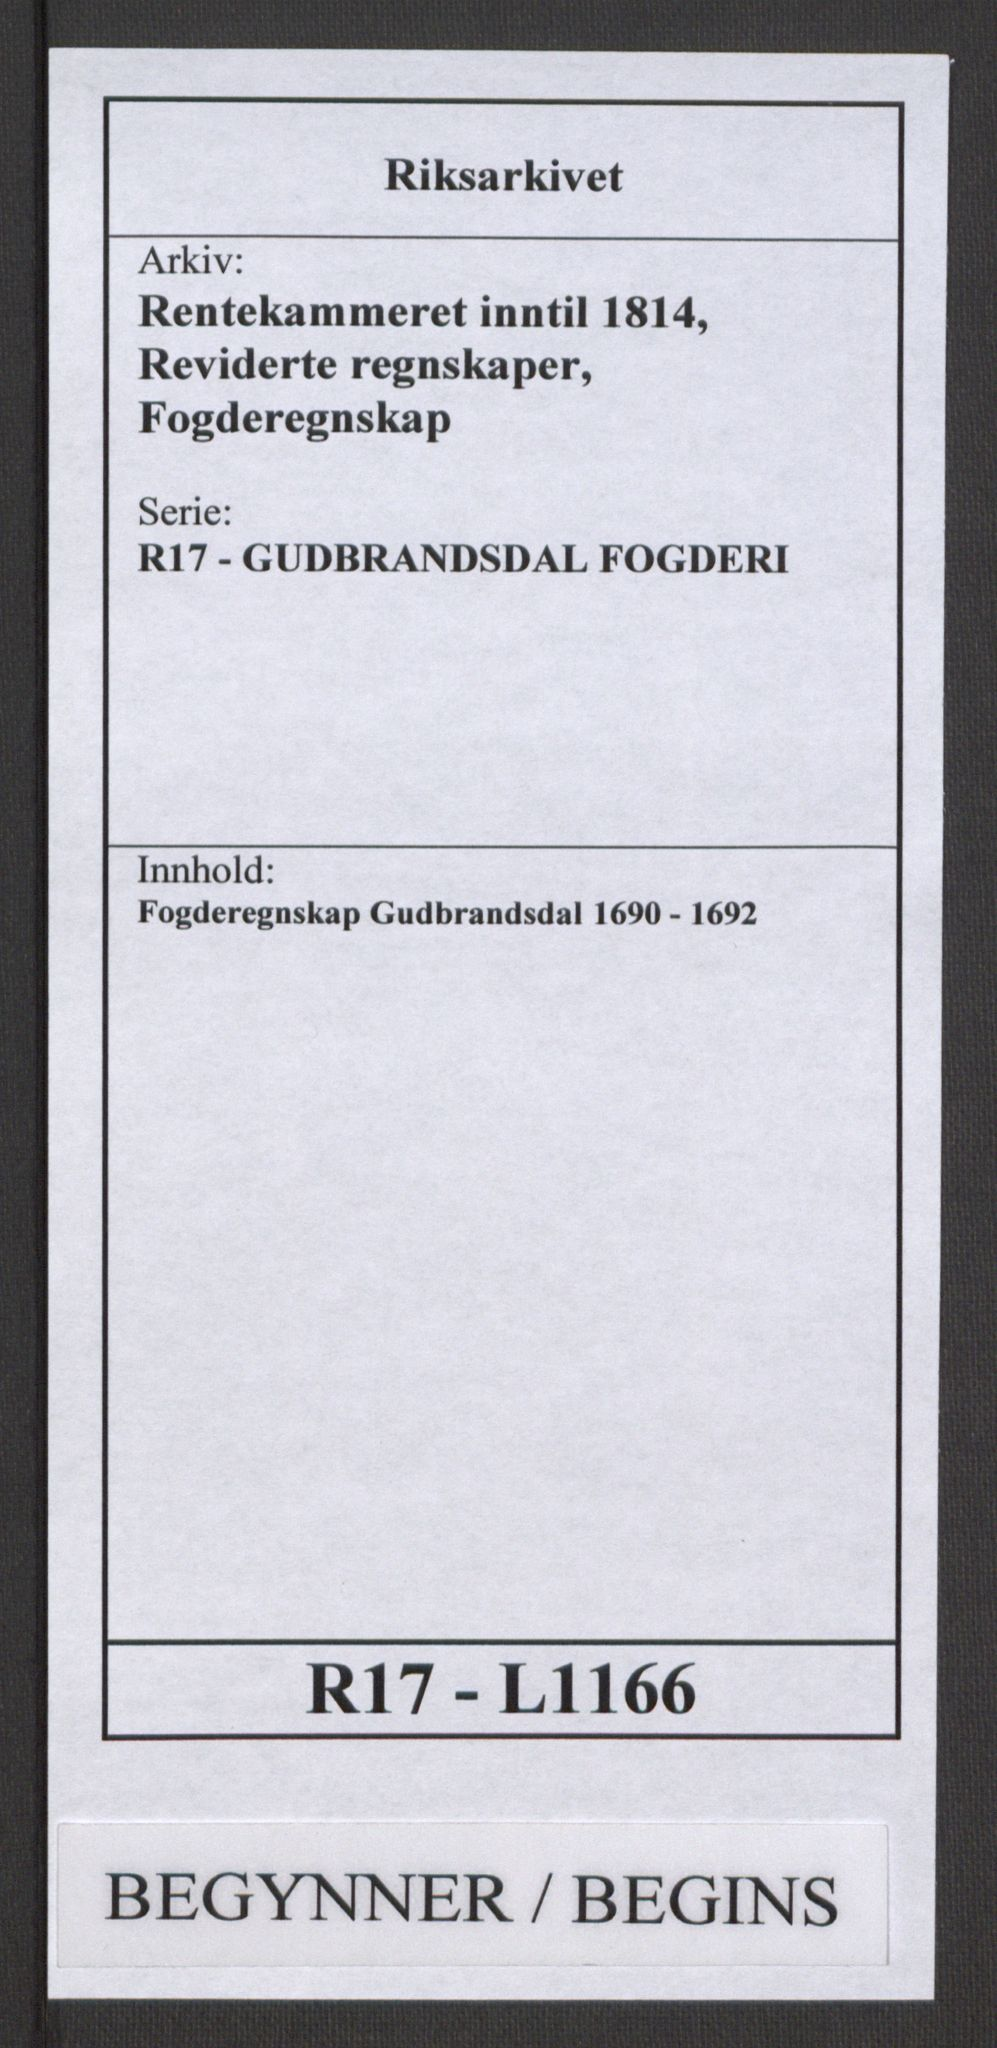 RA, Rentekammeret inntil 1814, Reviderte regnskaper, Fogderegnskap, R17/L1166: Fogderegnskap Gudbrandsdal, 1690-1692, s. 1